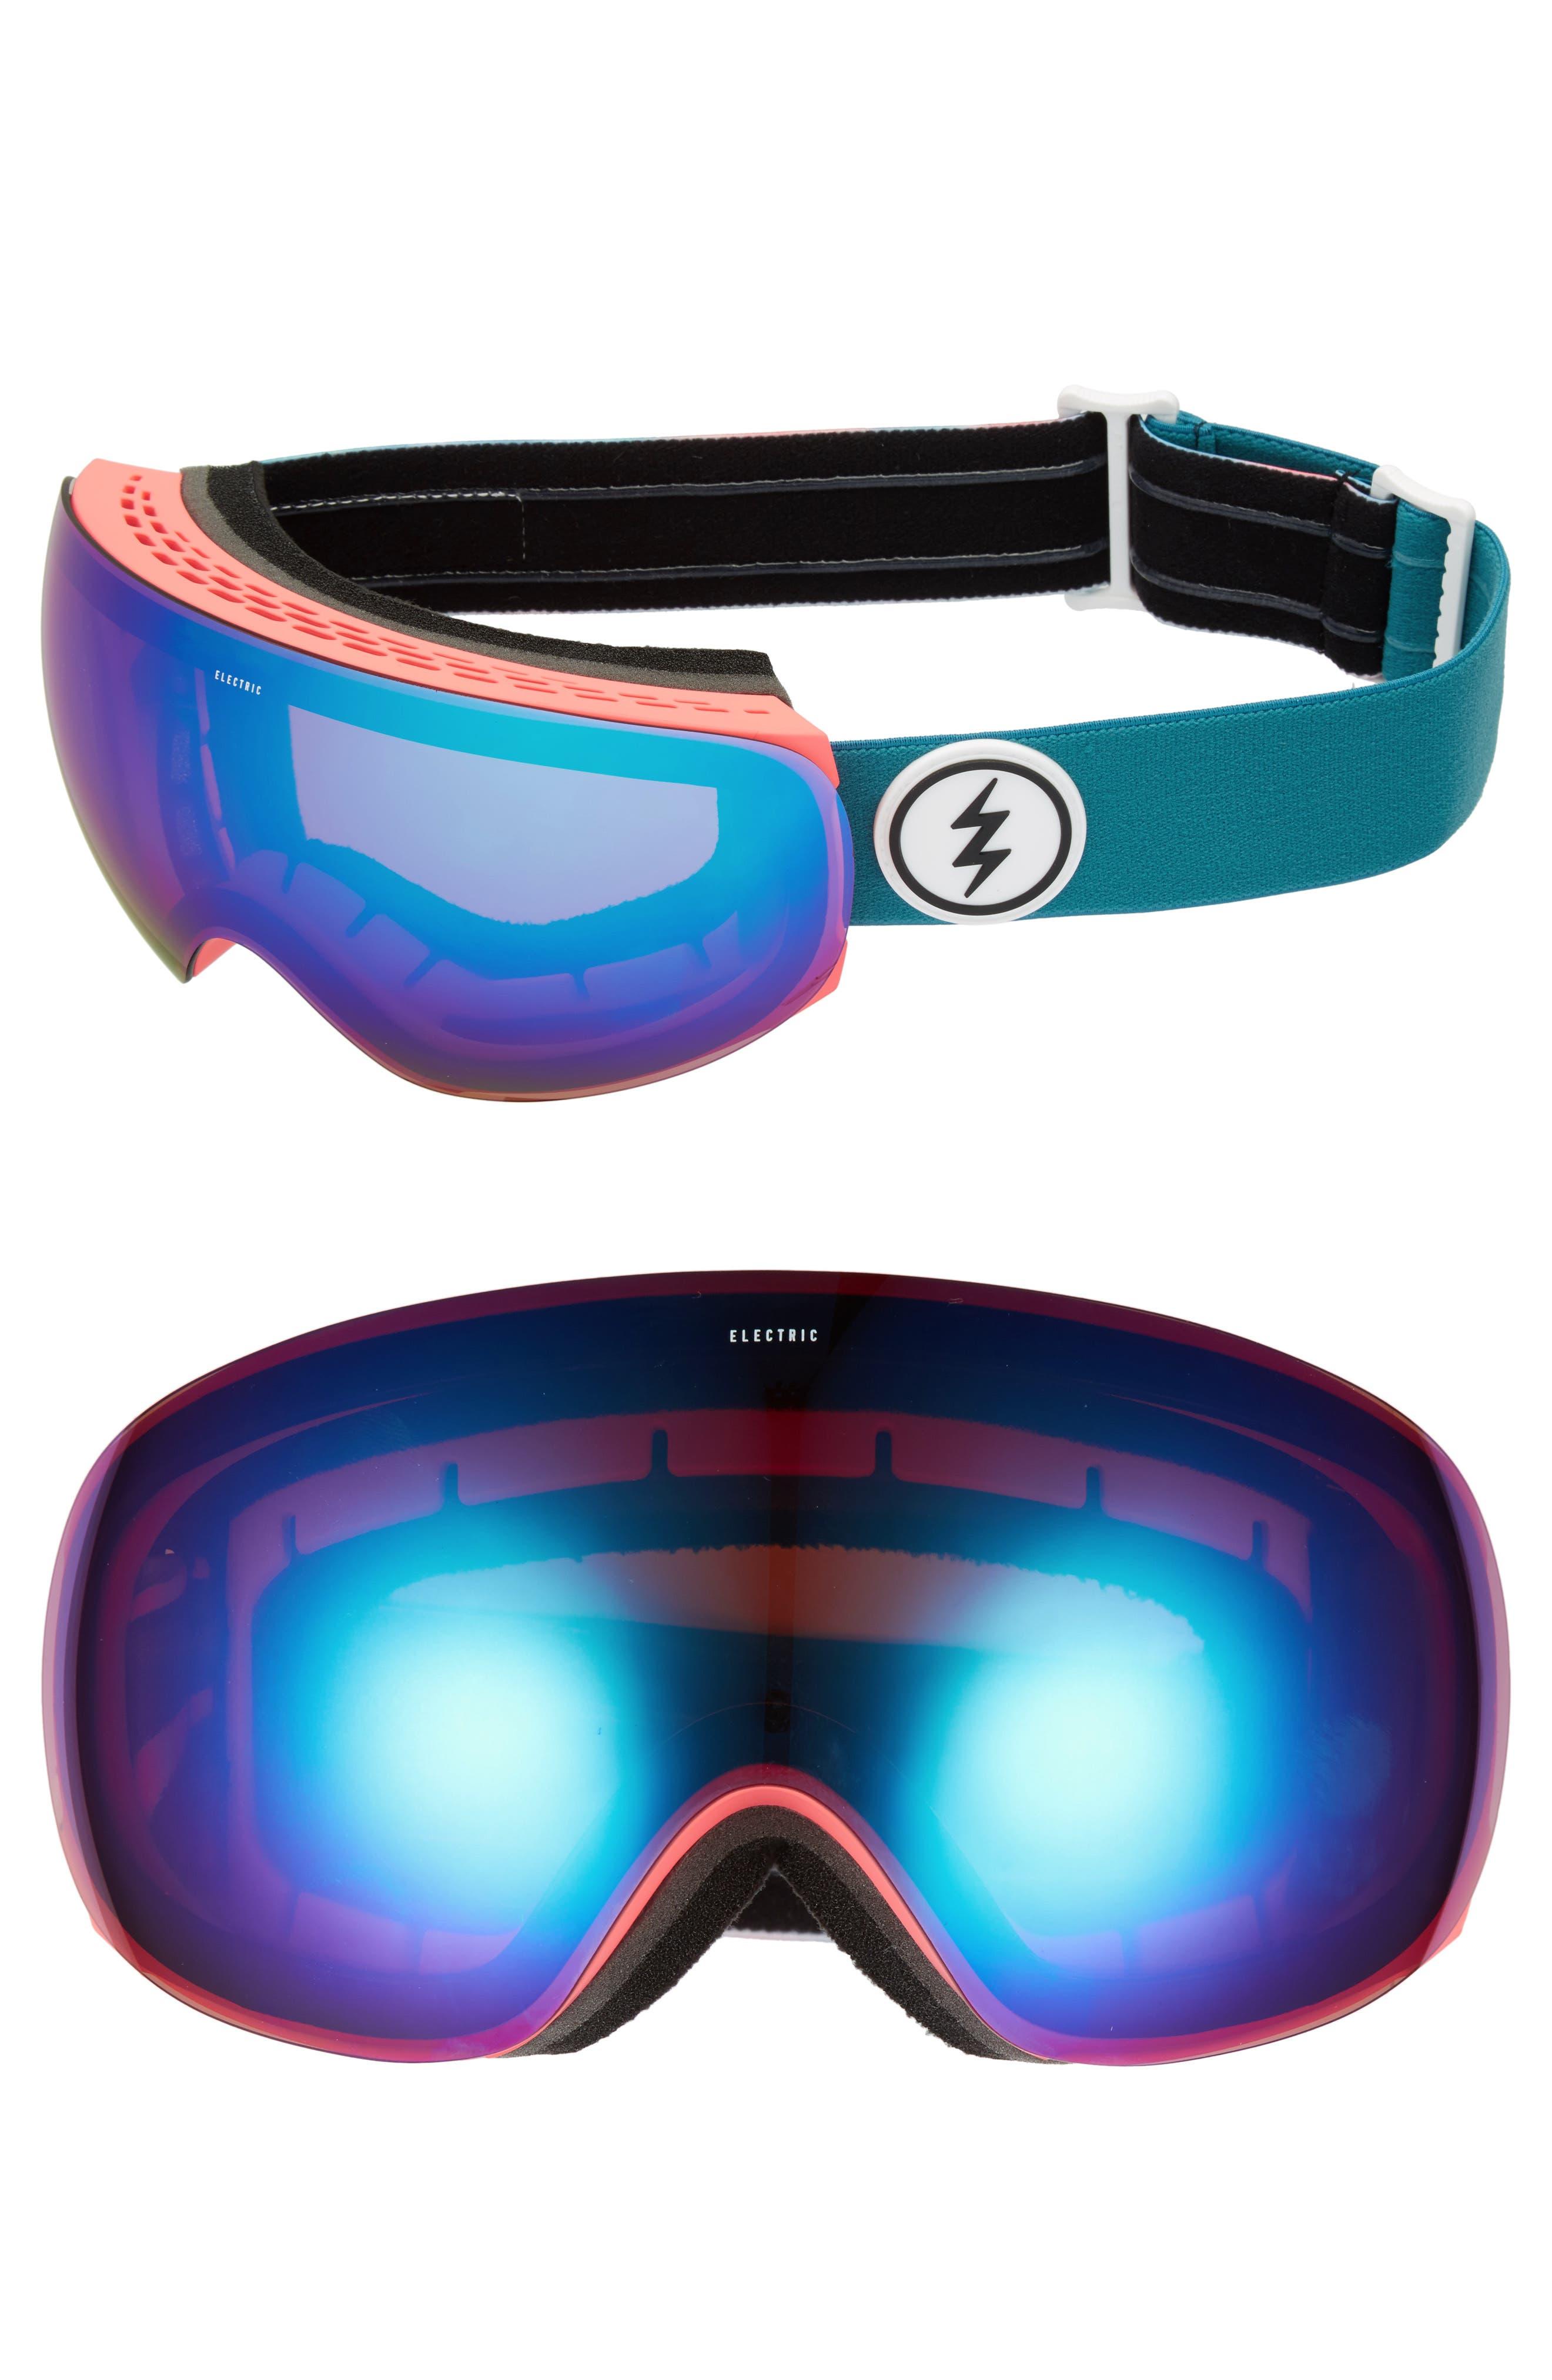 EG3.5 Snow Goggles,                             Main thumbnail 2, color,